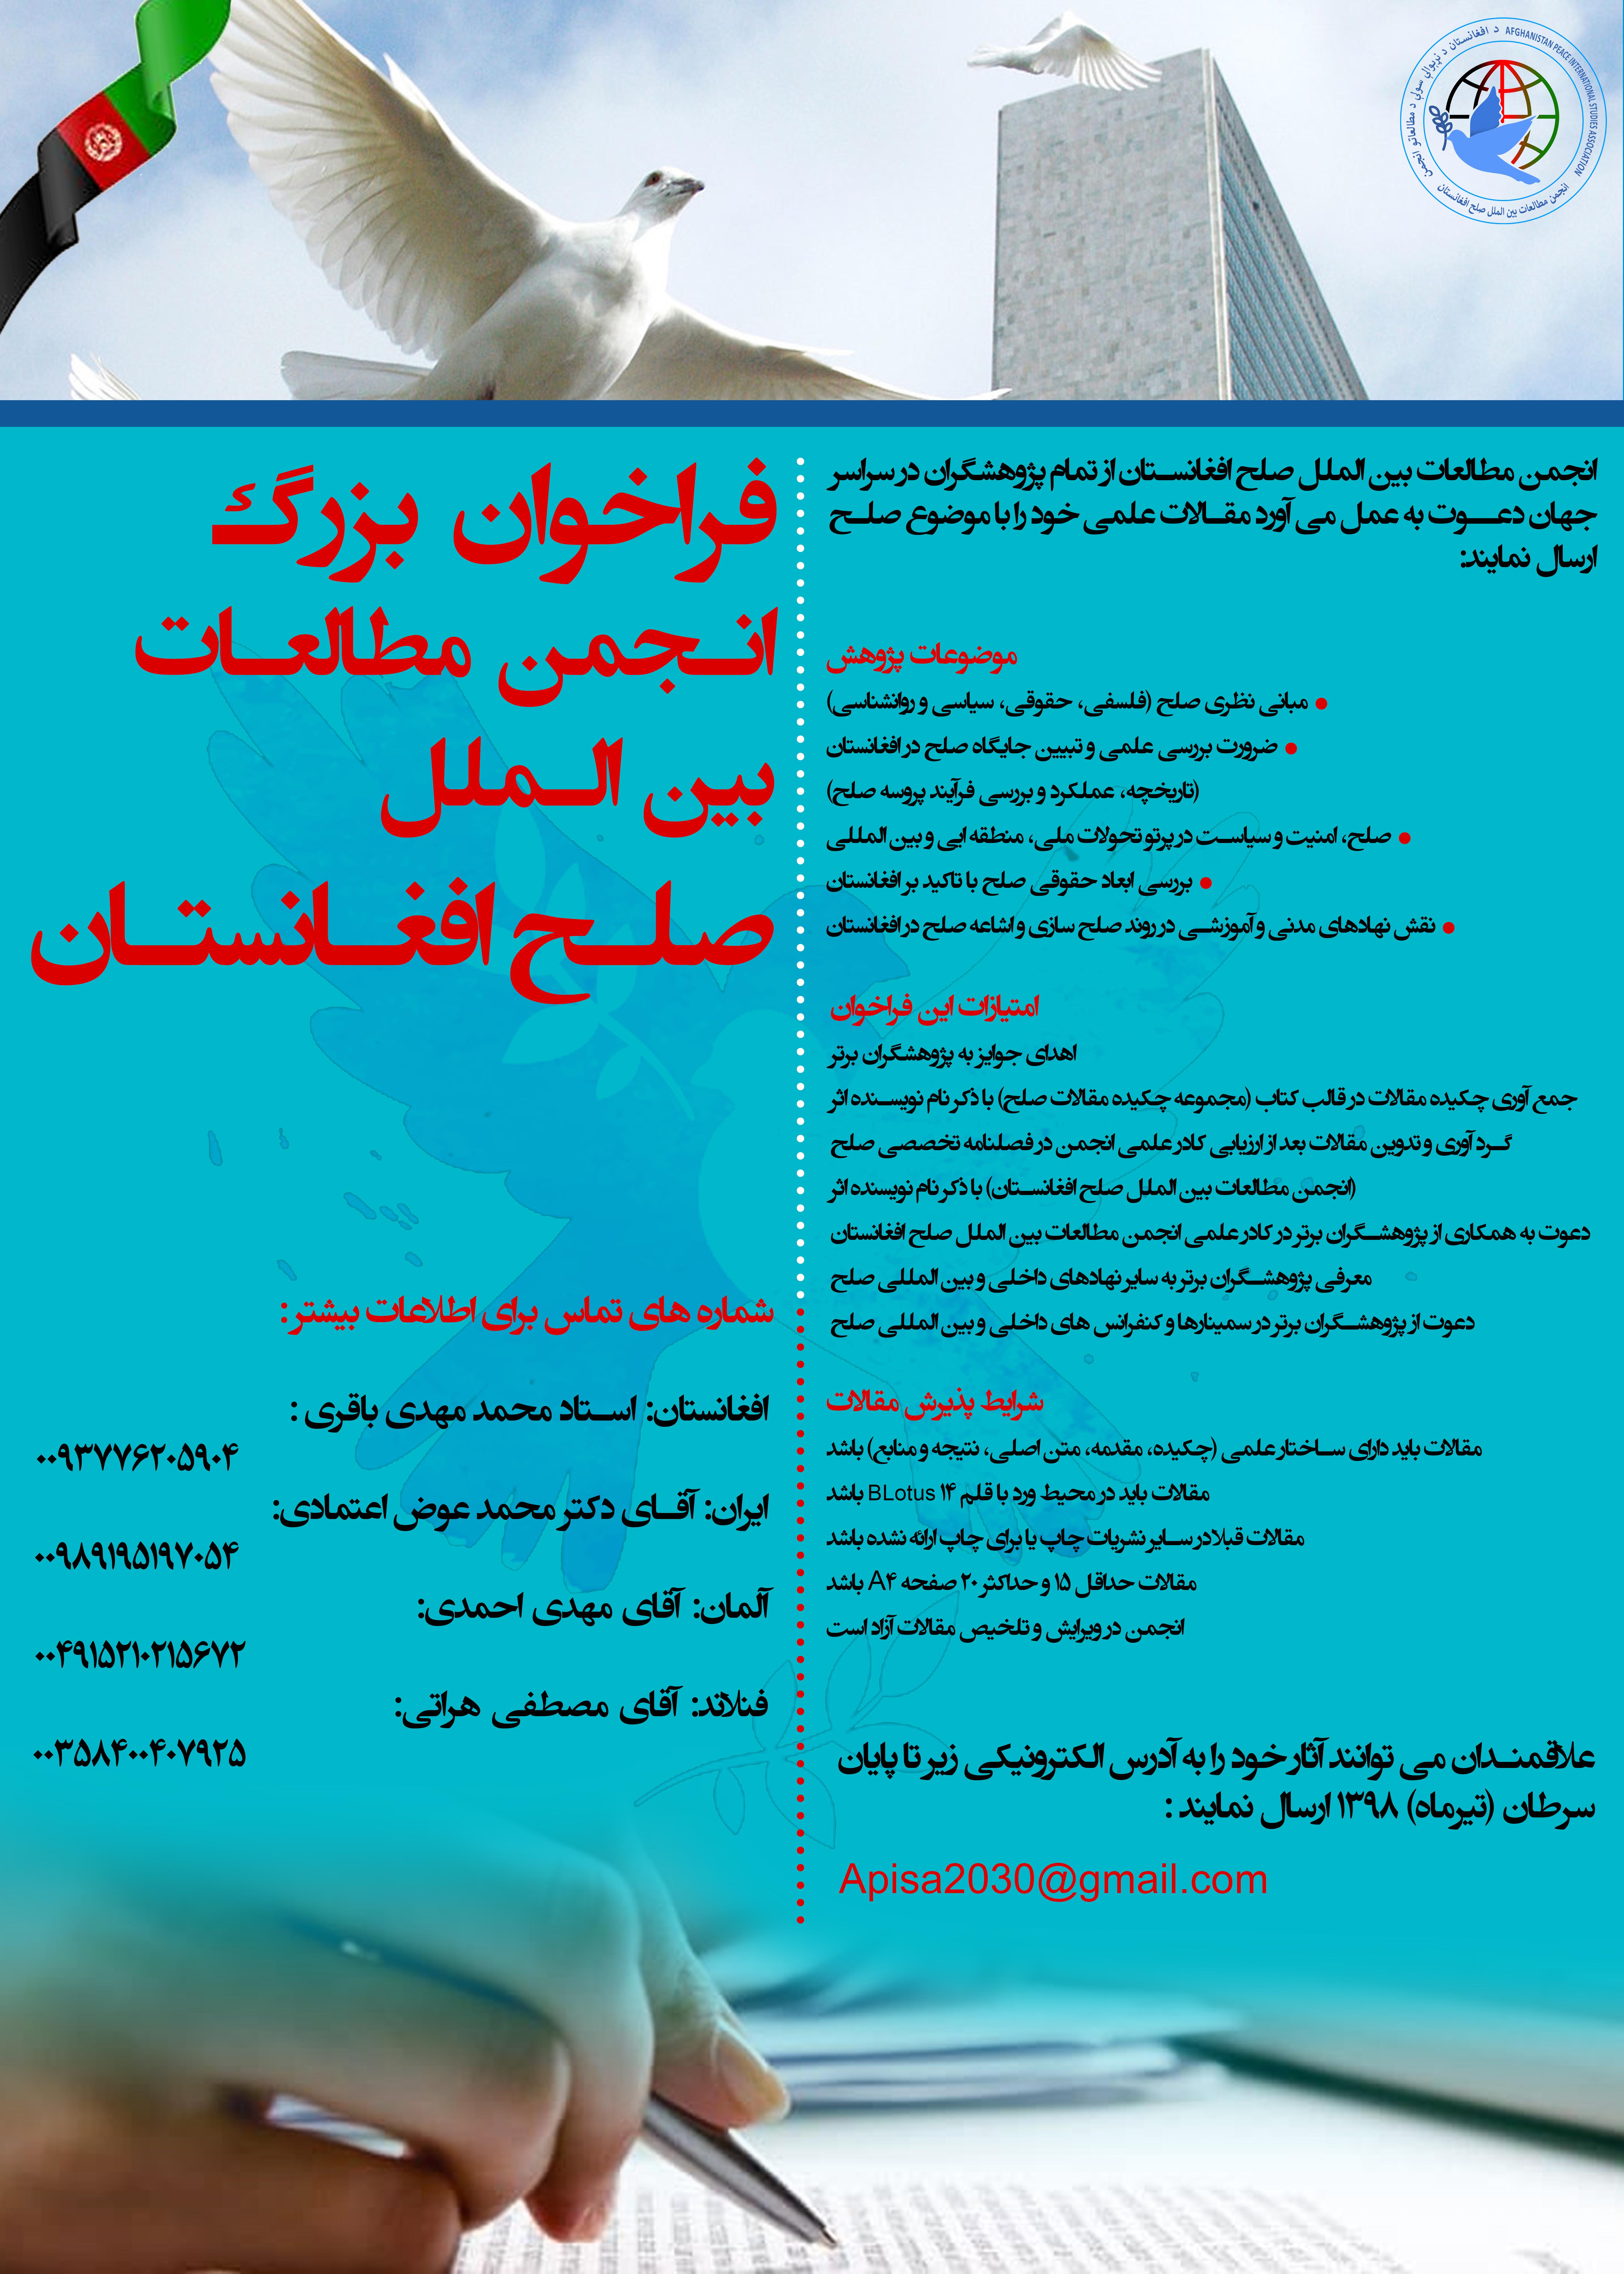 فراخوان مقاله صلح انجمن مطالعات بین الملل صلح افغانستان